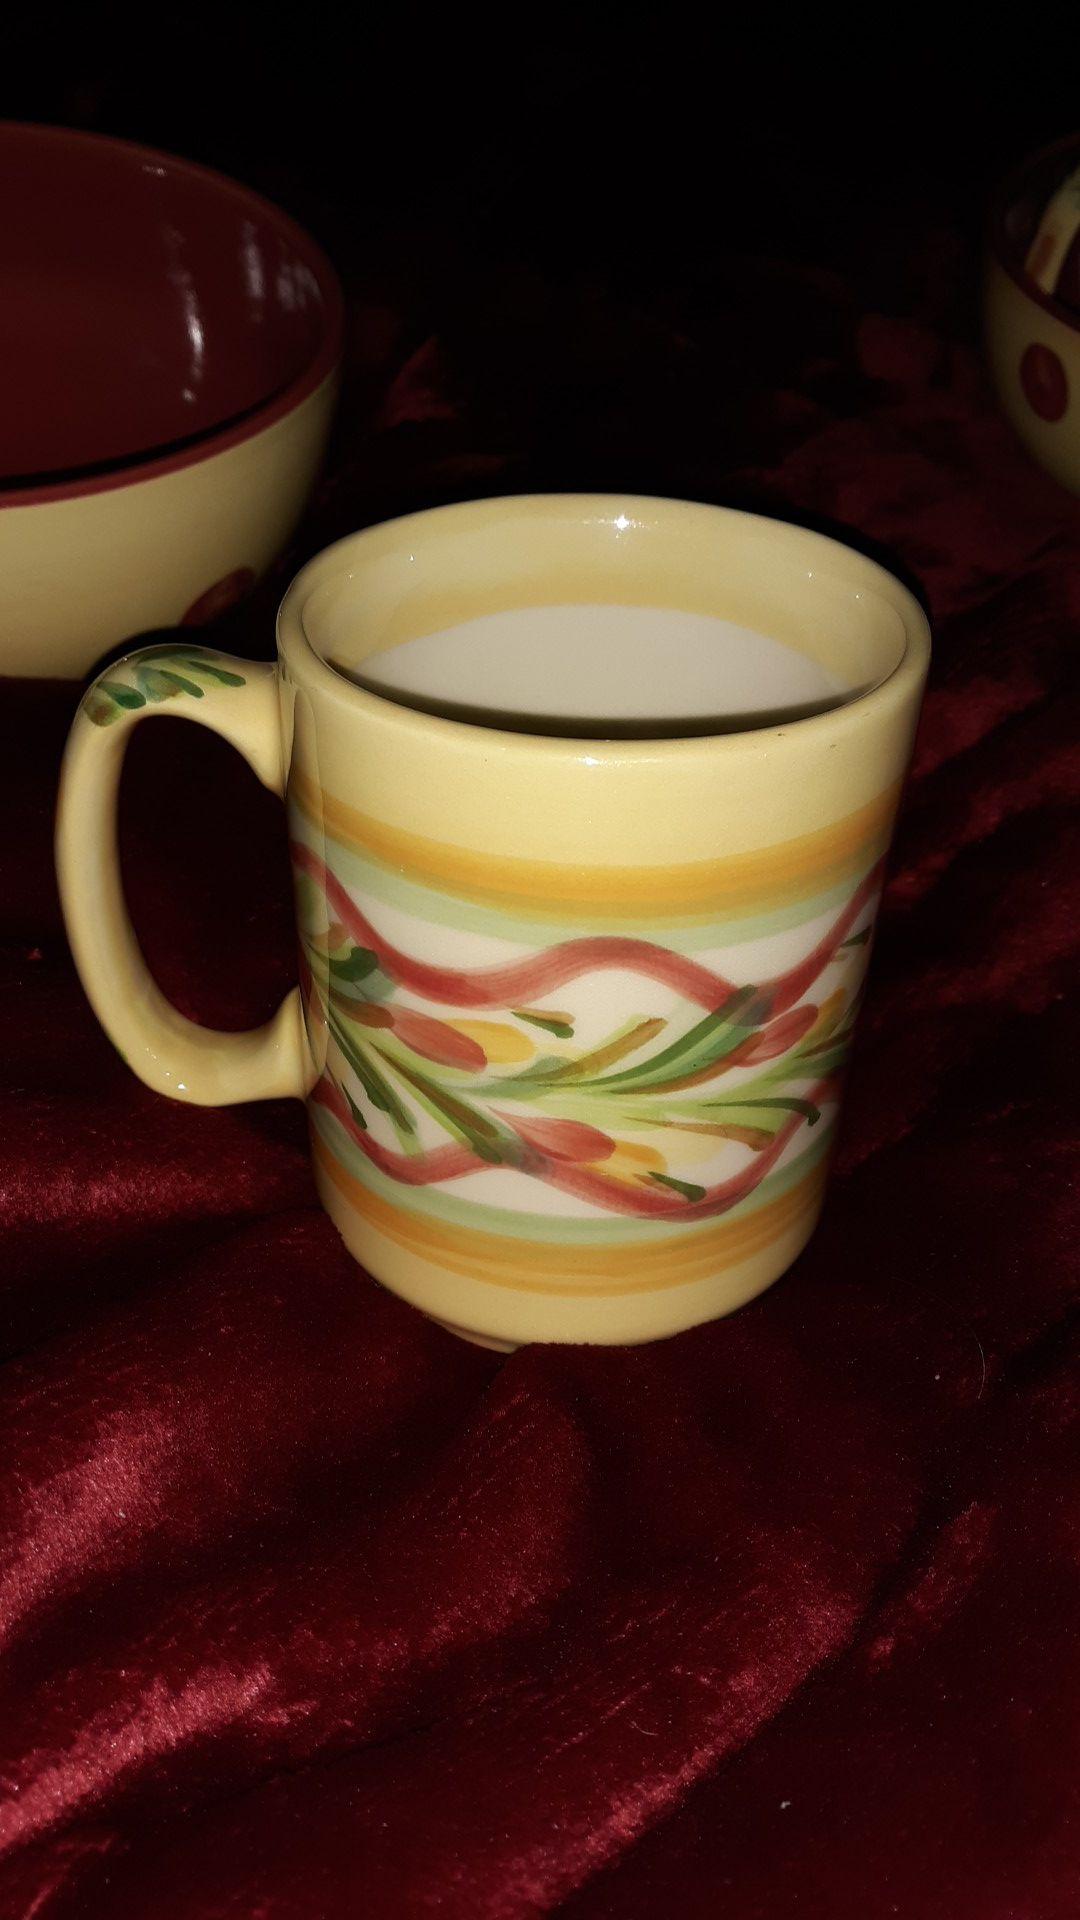 Coffee and bowl set